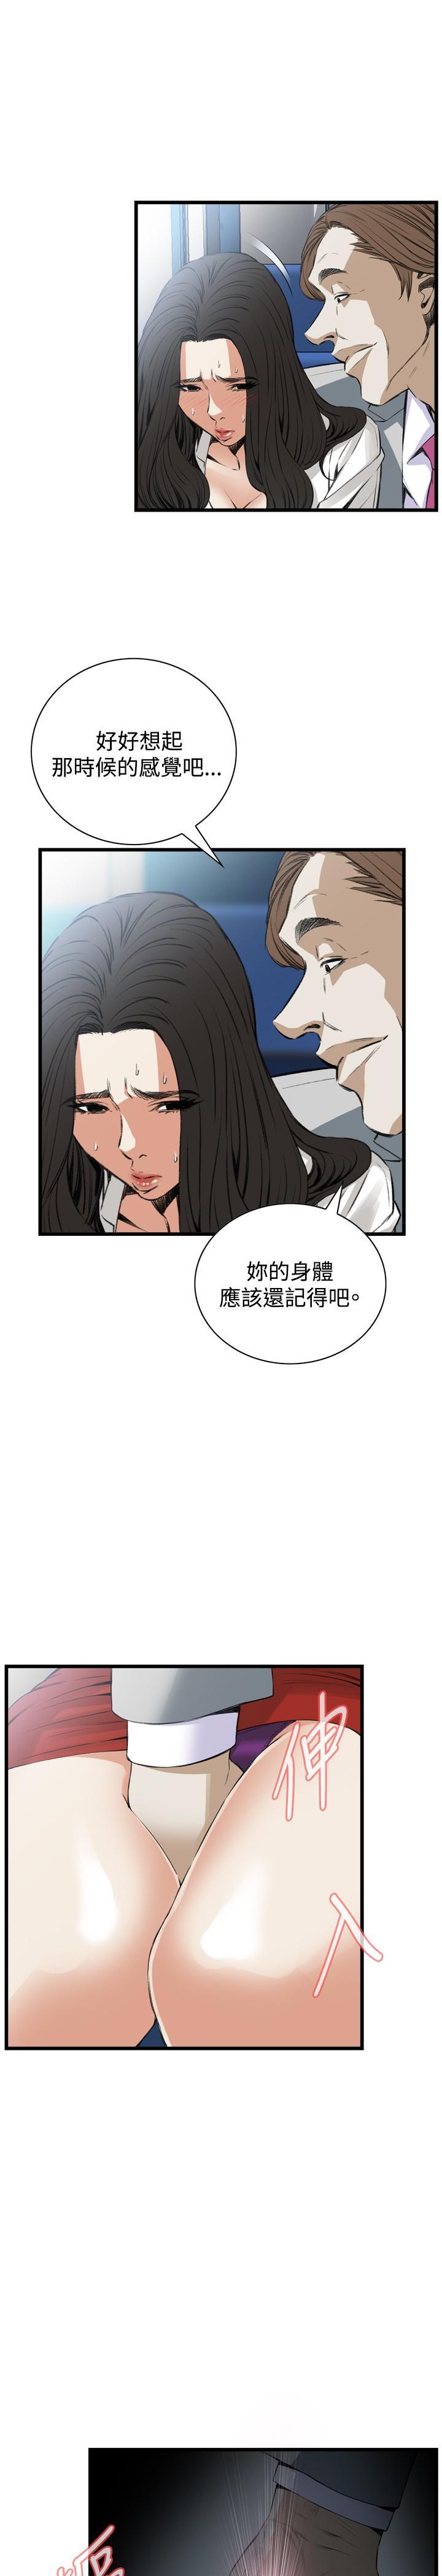 Take a Peek 偷窥 Ch.39~55 [Chinese]中文 322